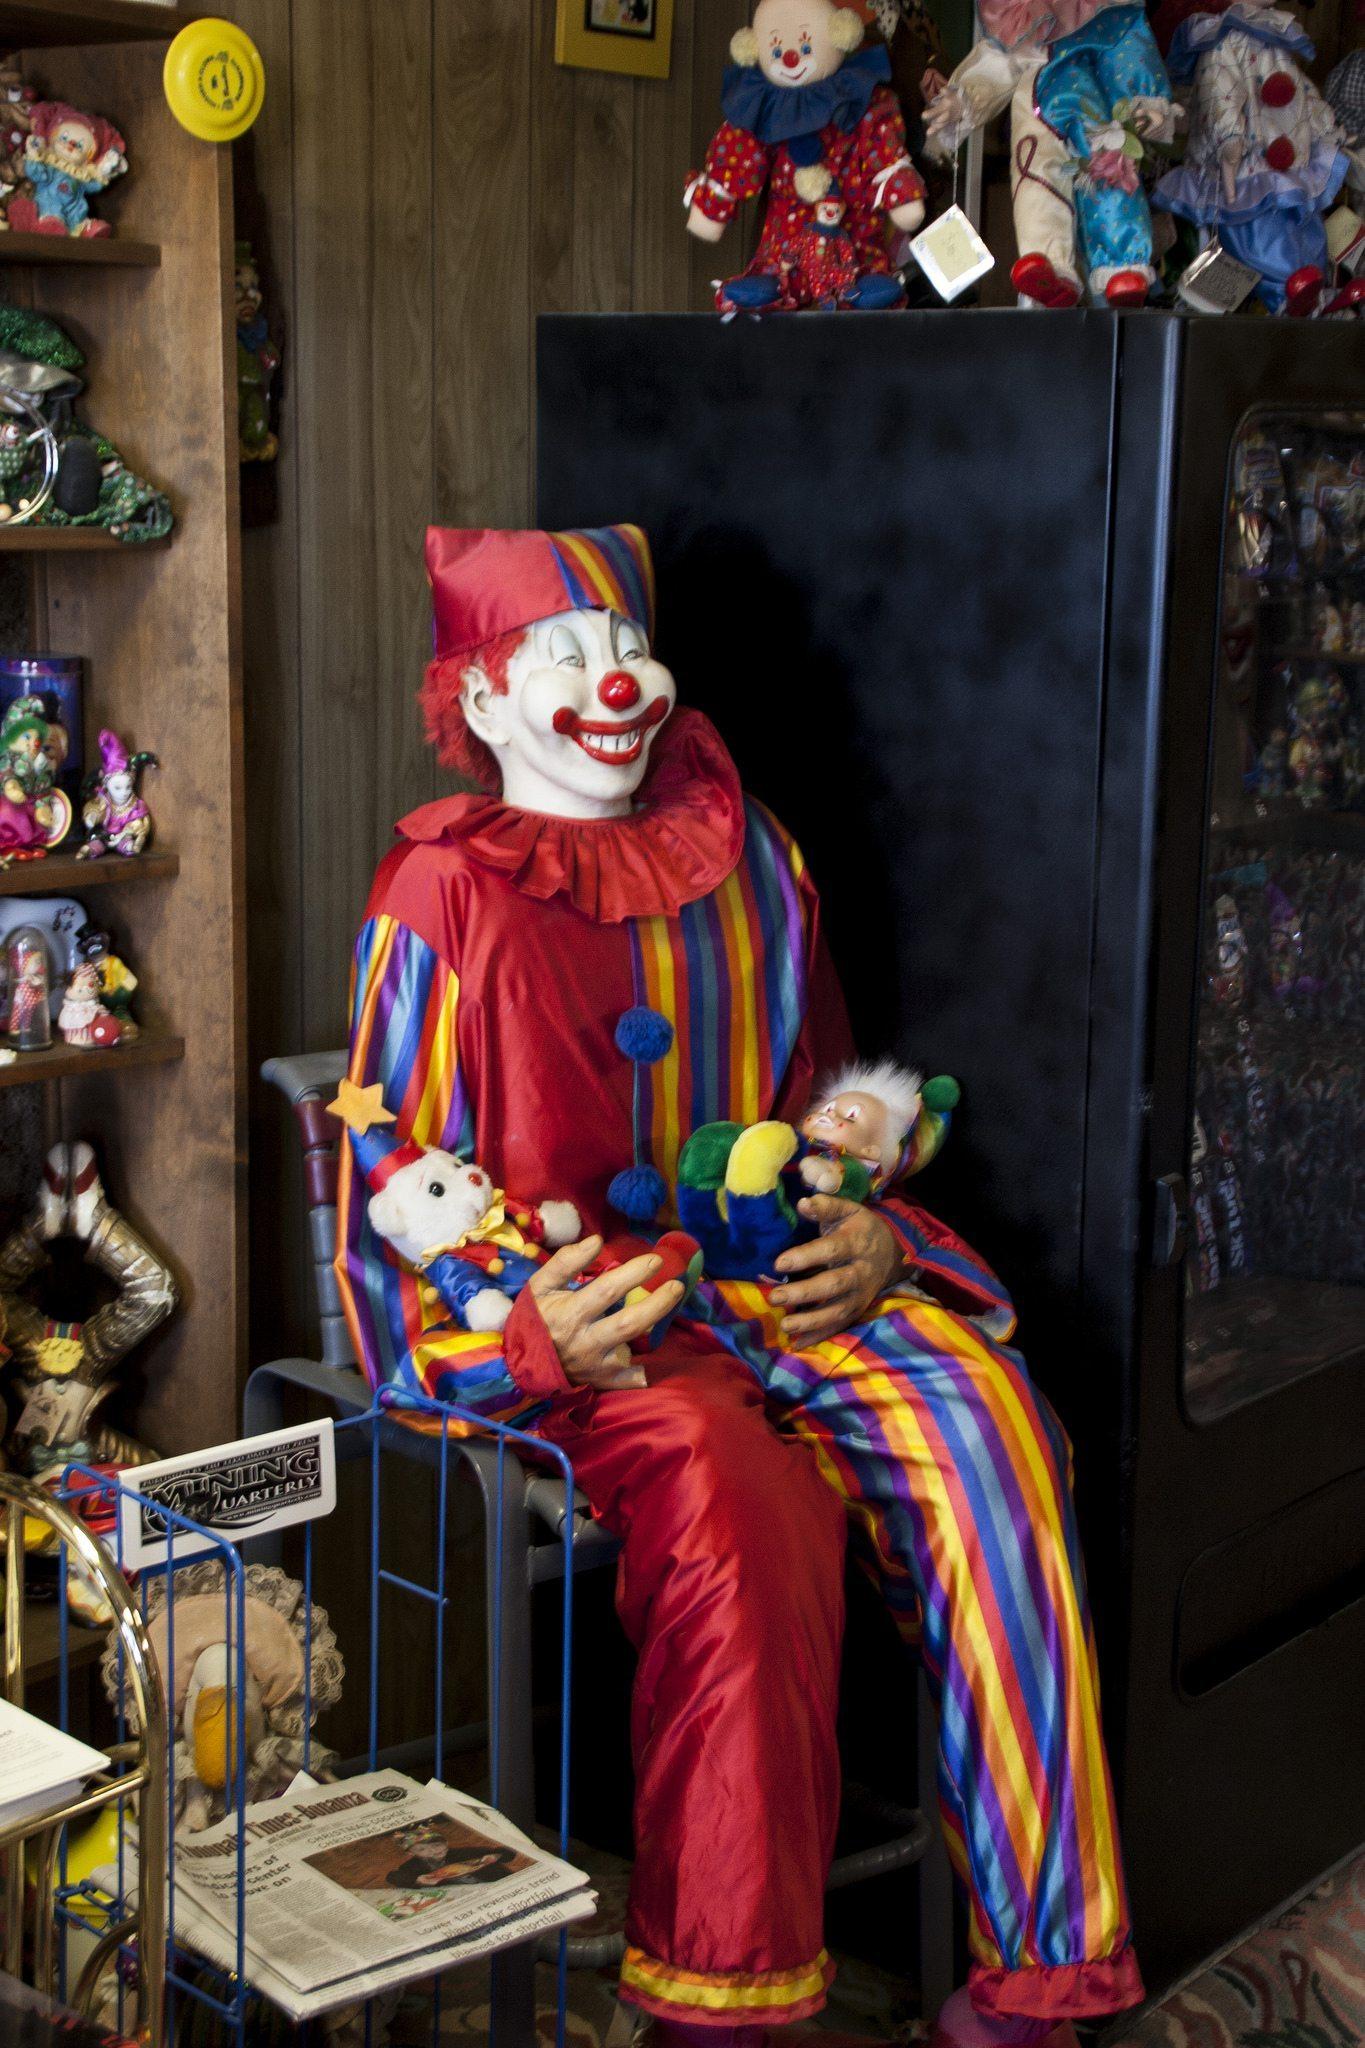 The lobby of the Clown Motel